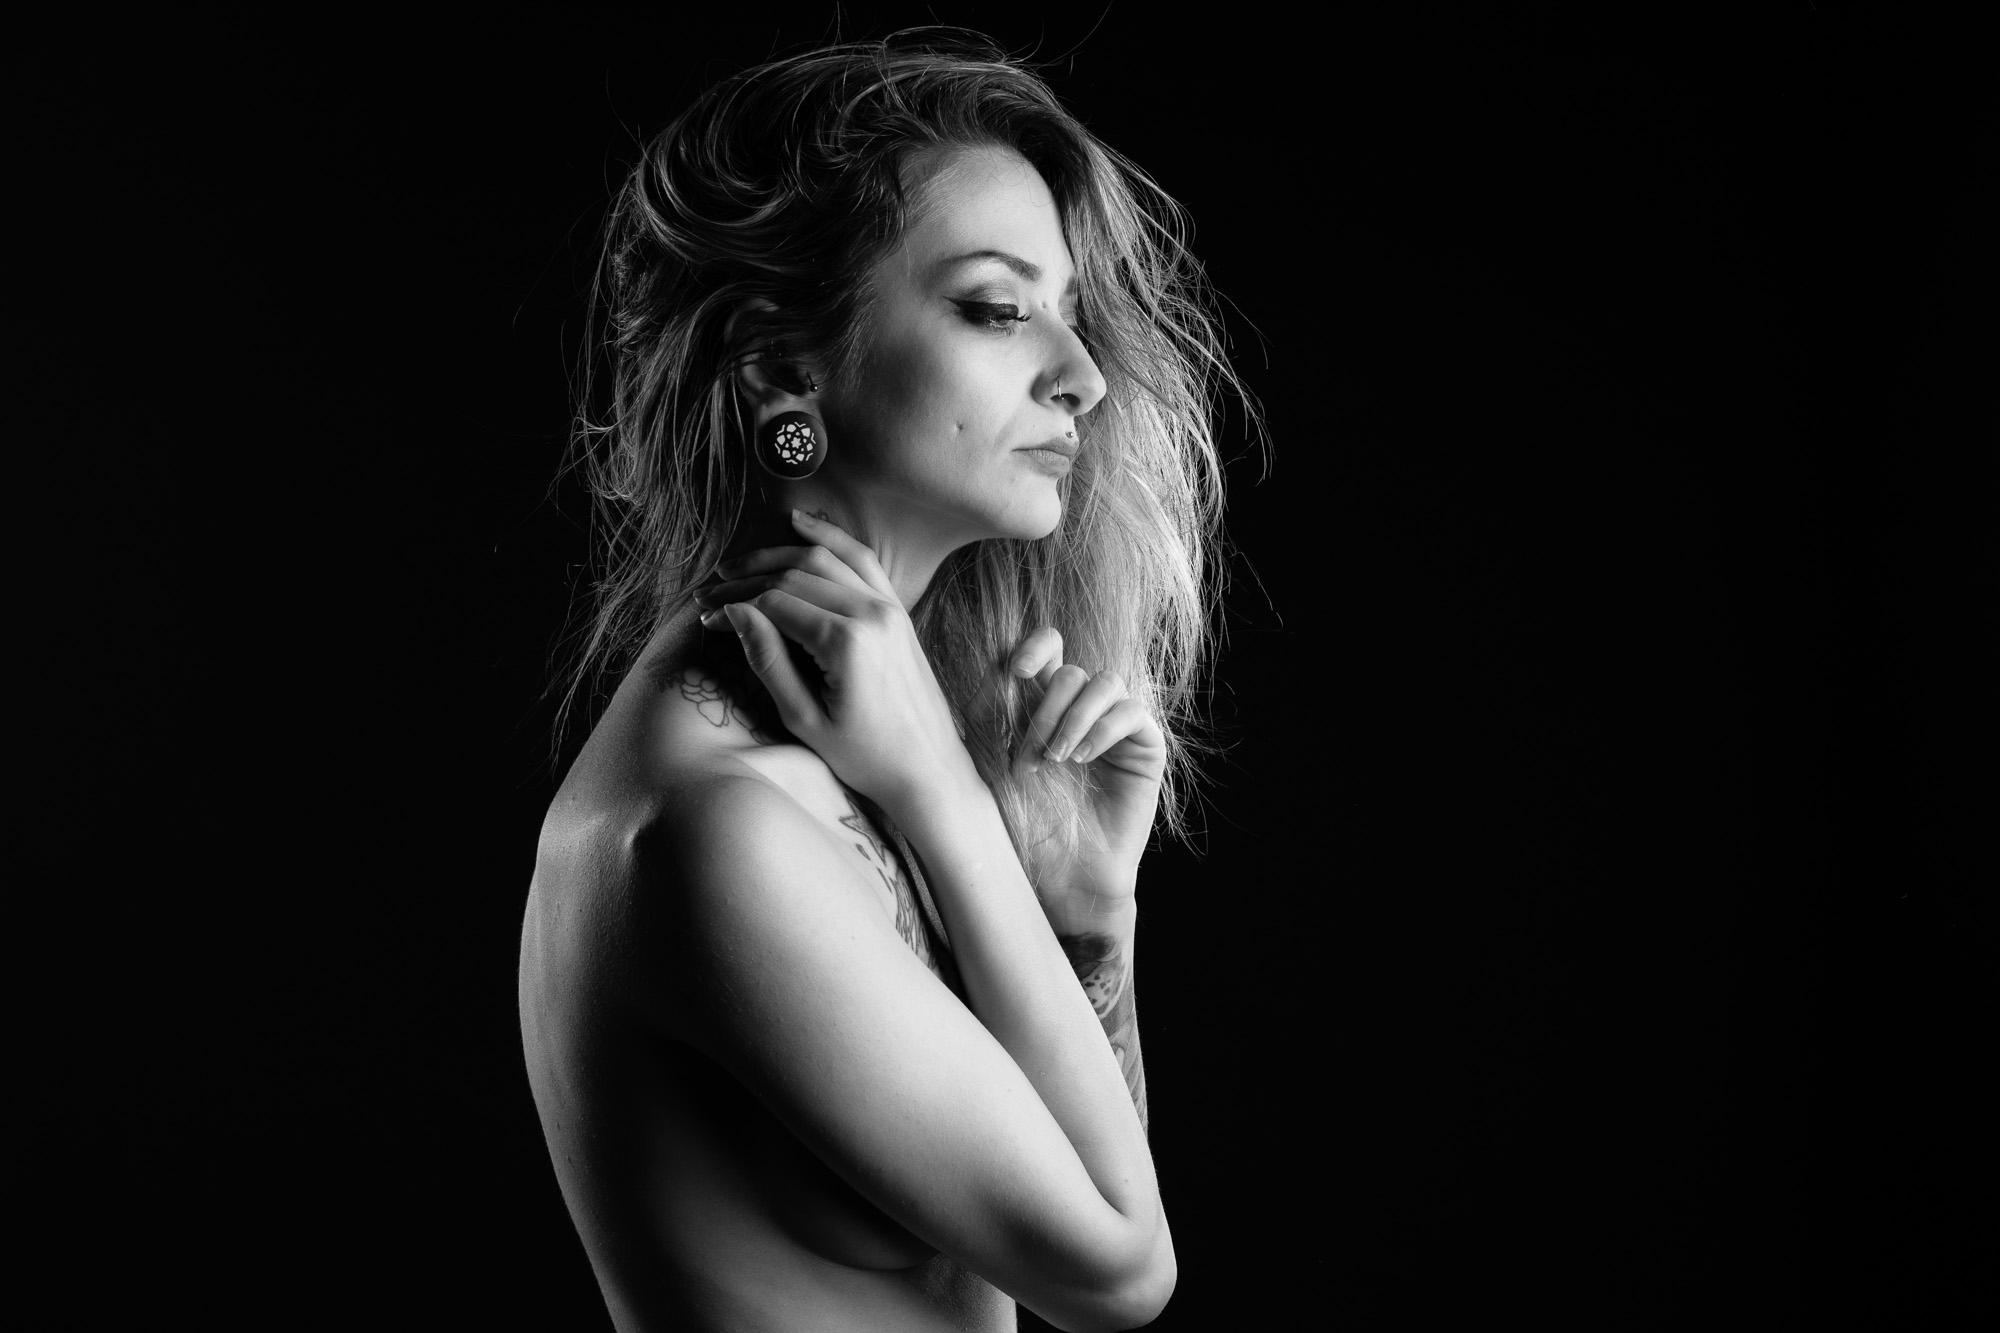 model: Theresa Manchester